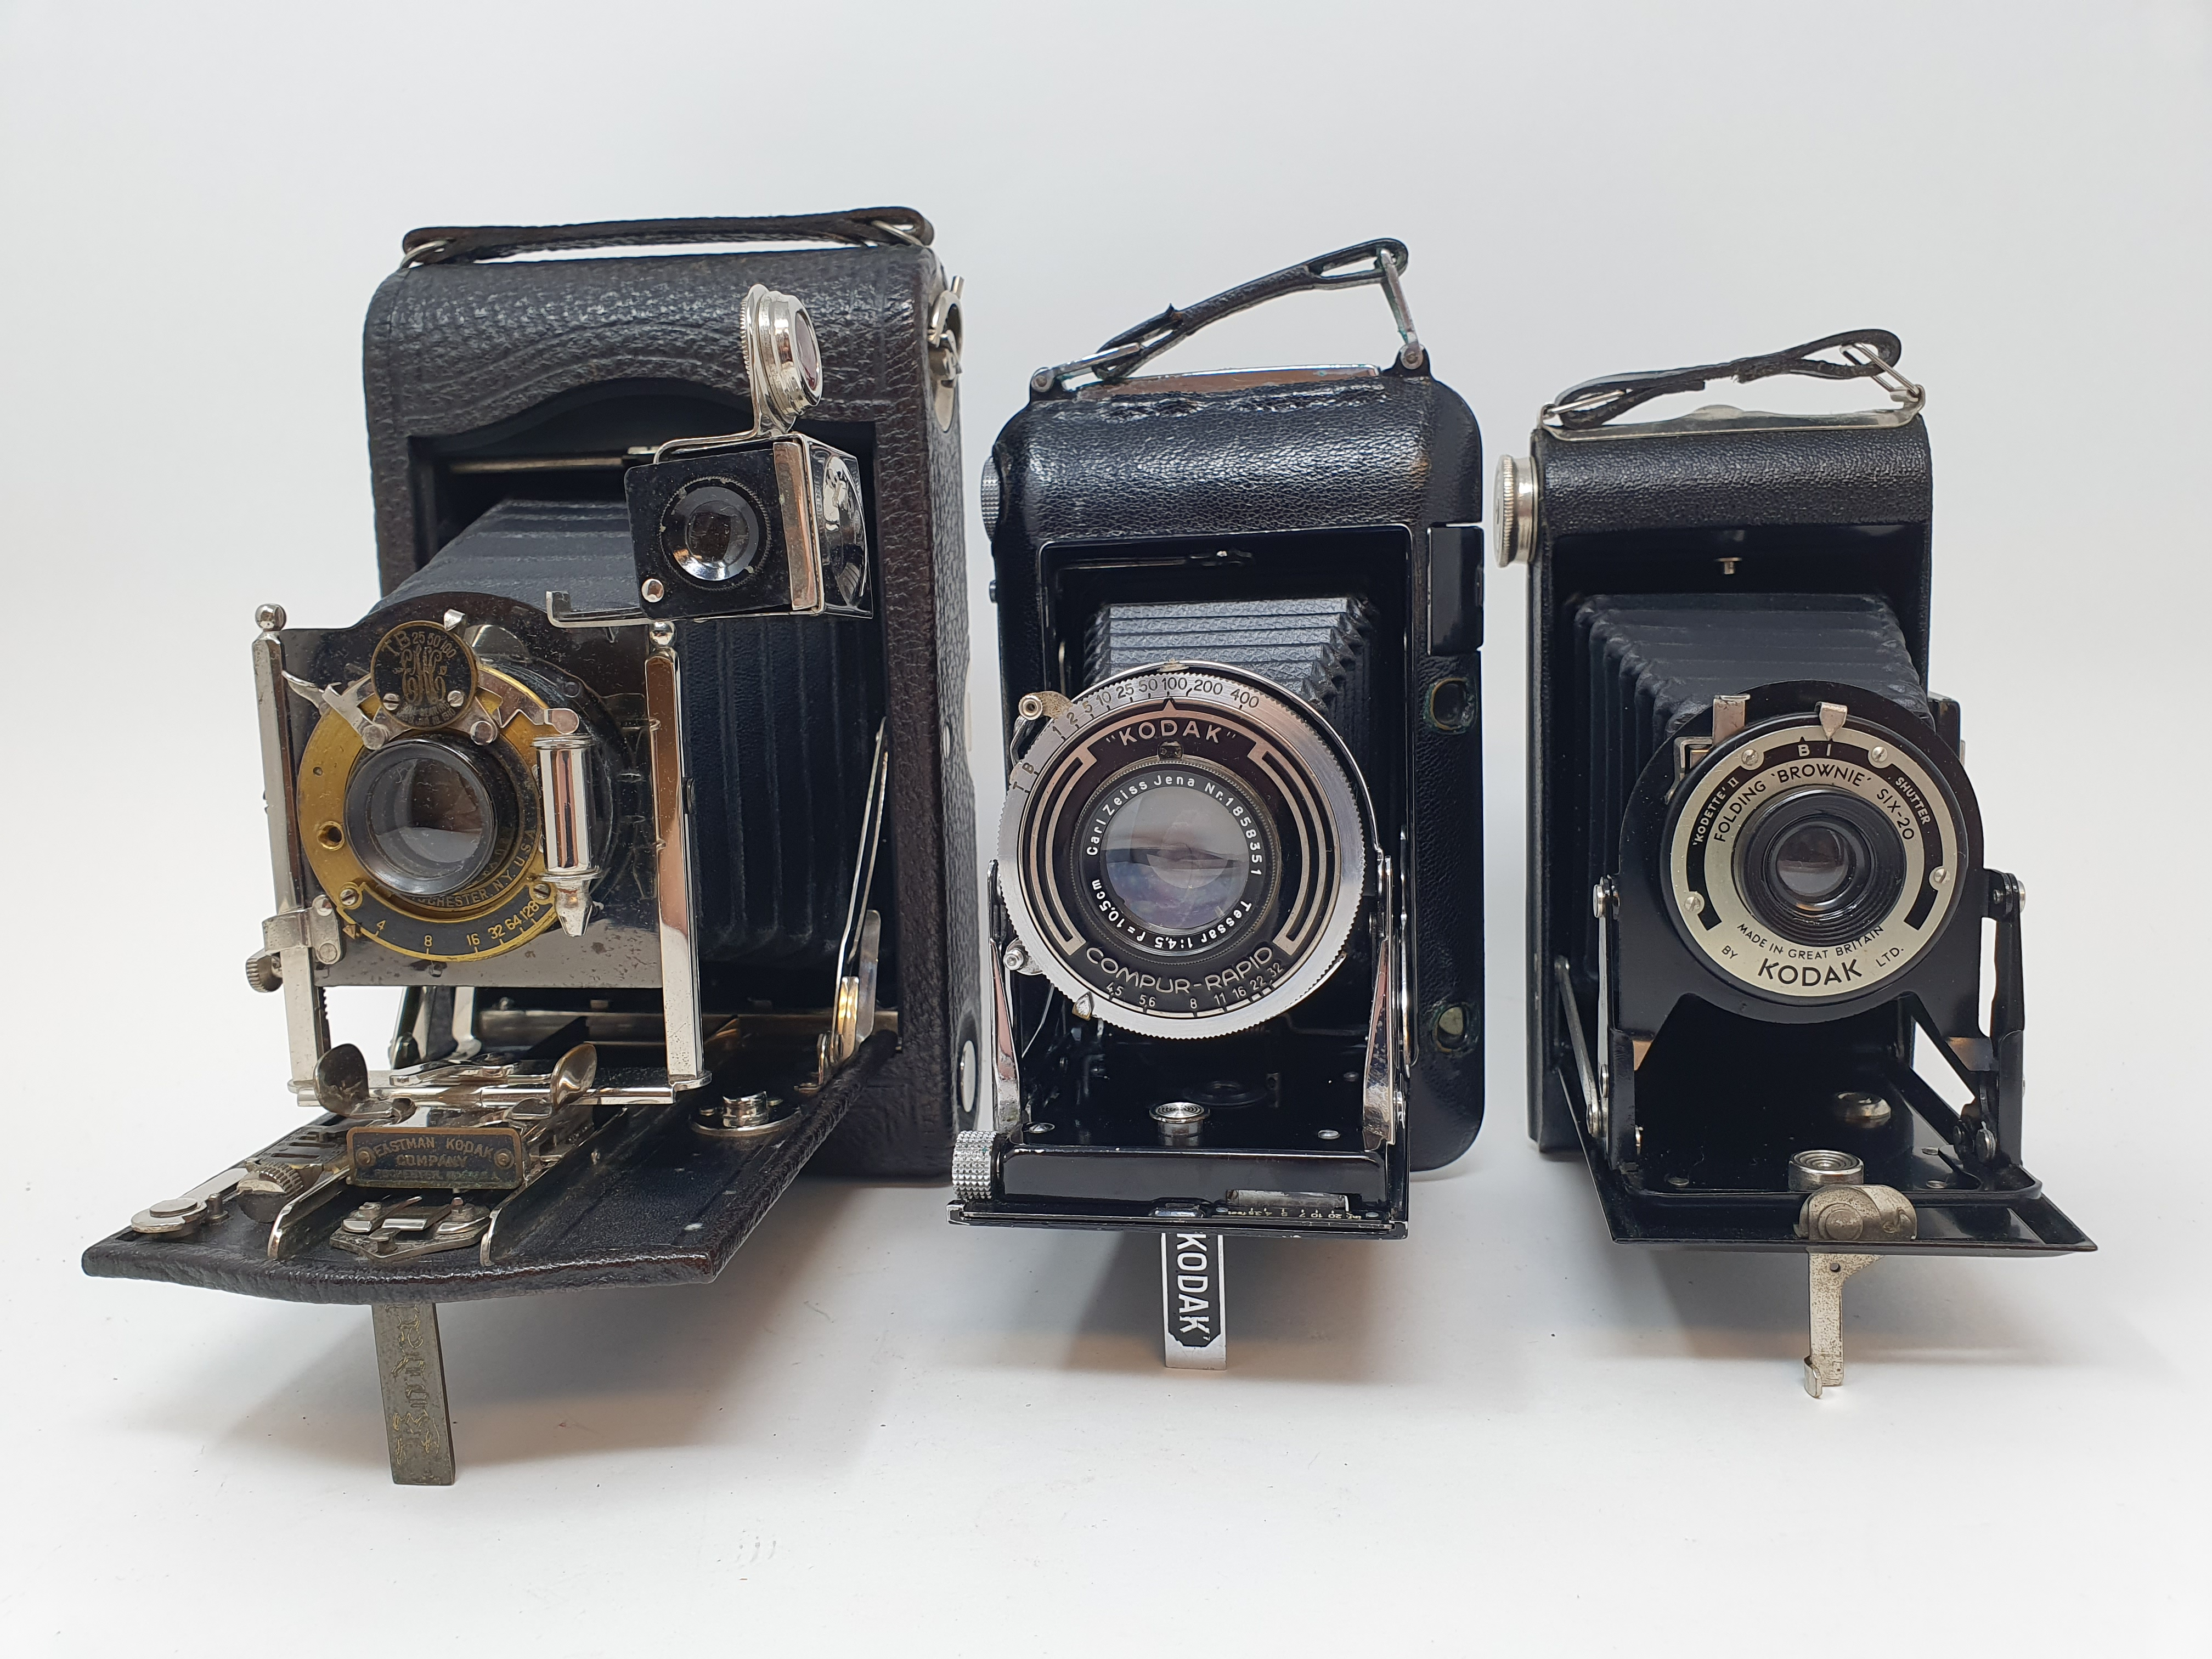 A Kodak Regent folding camera, with leather outer case, a Kodak folding camera, with leather outer